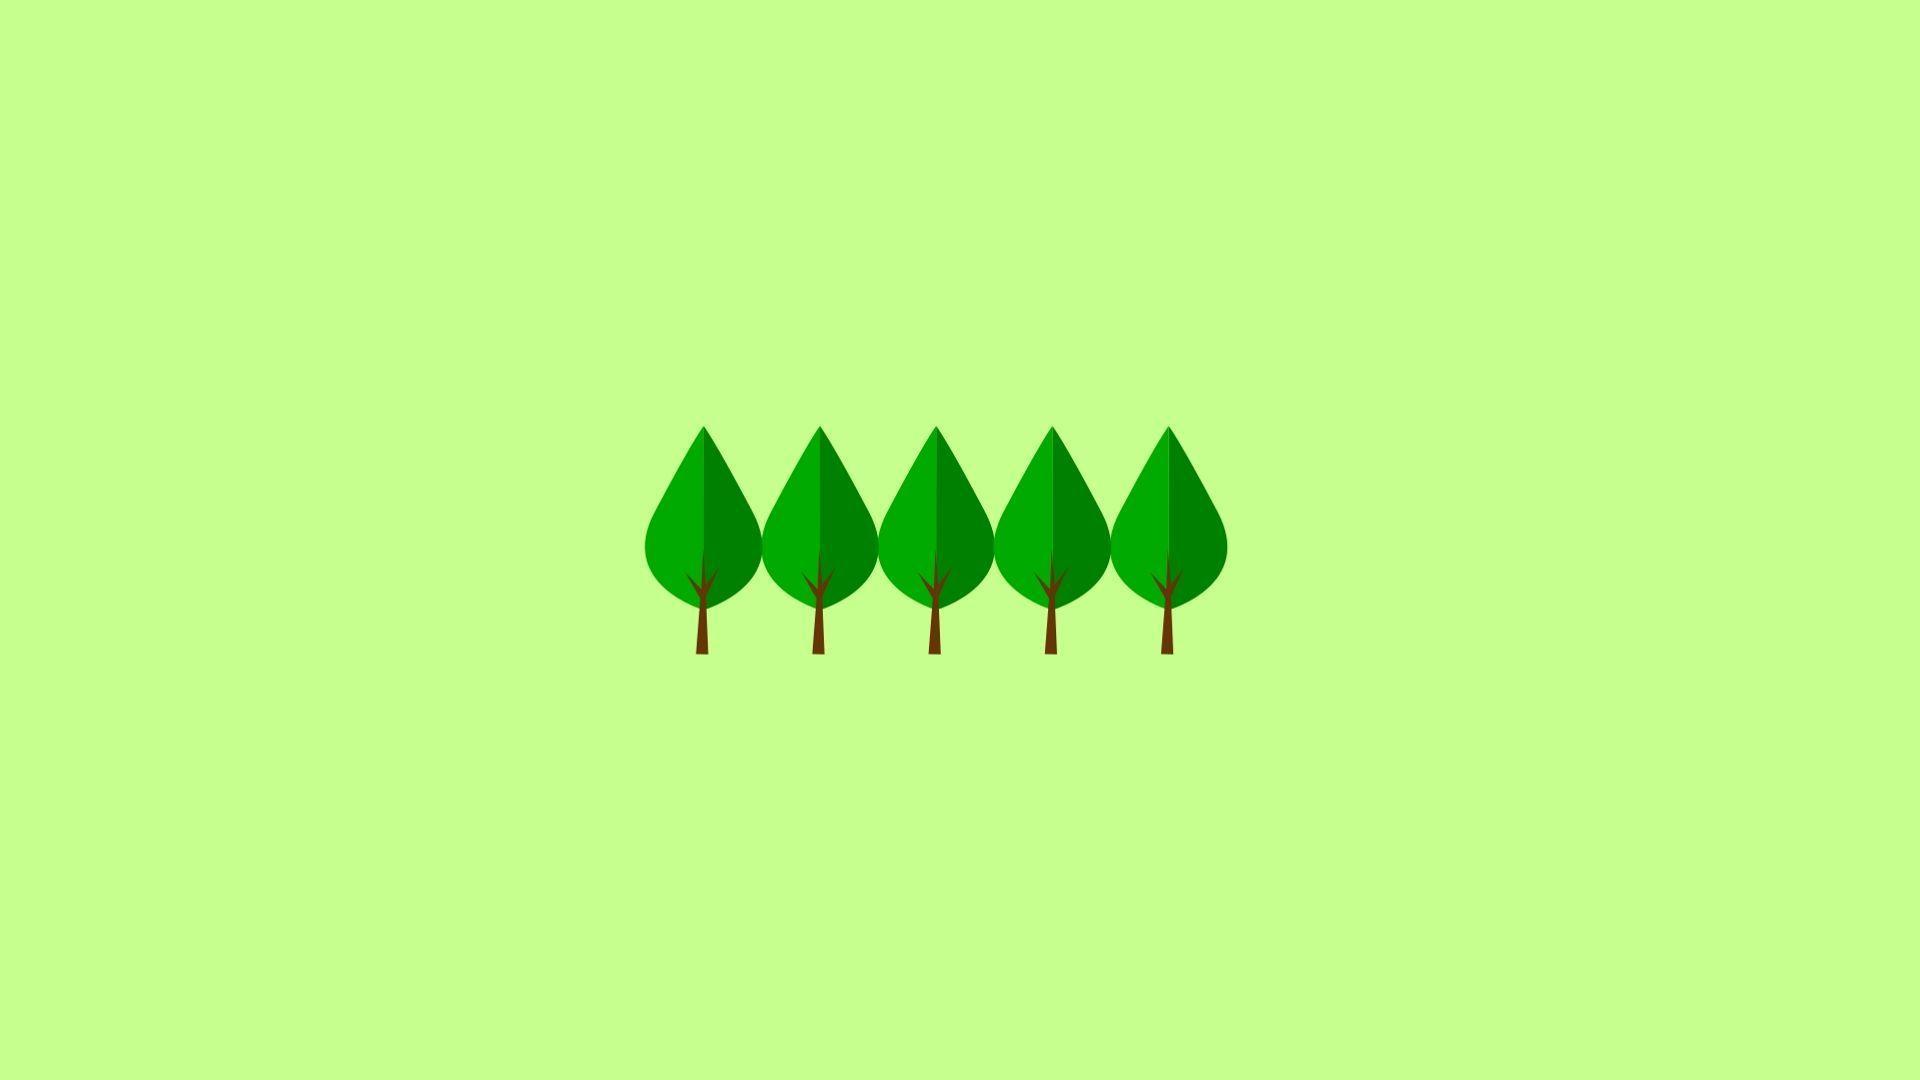 Green Minimalist Wallpapers - Top Free ...